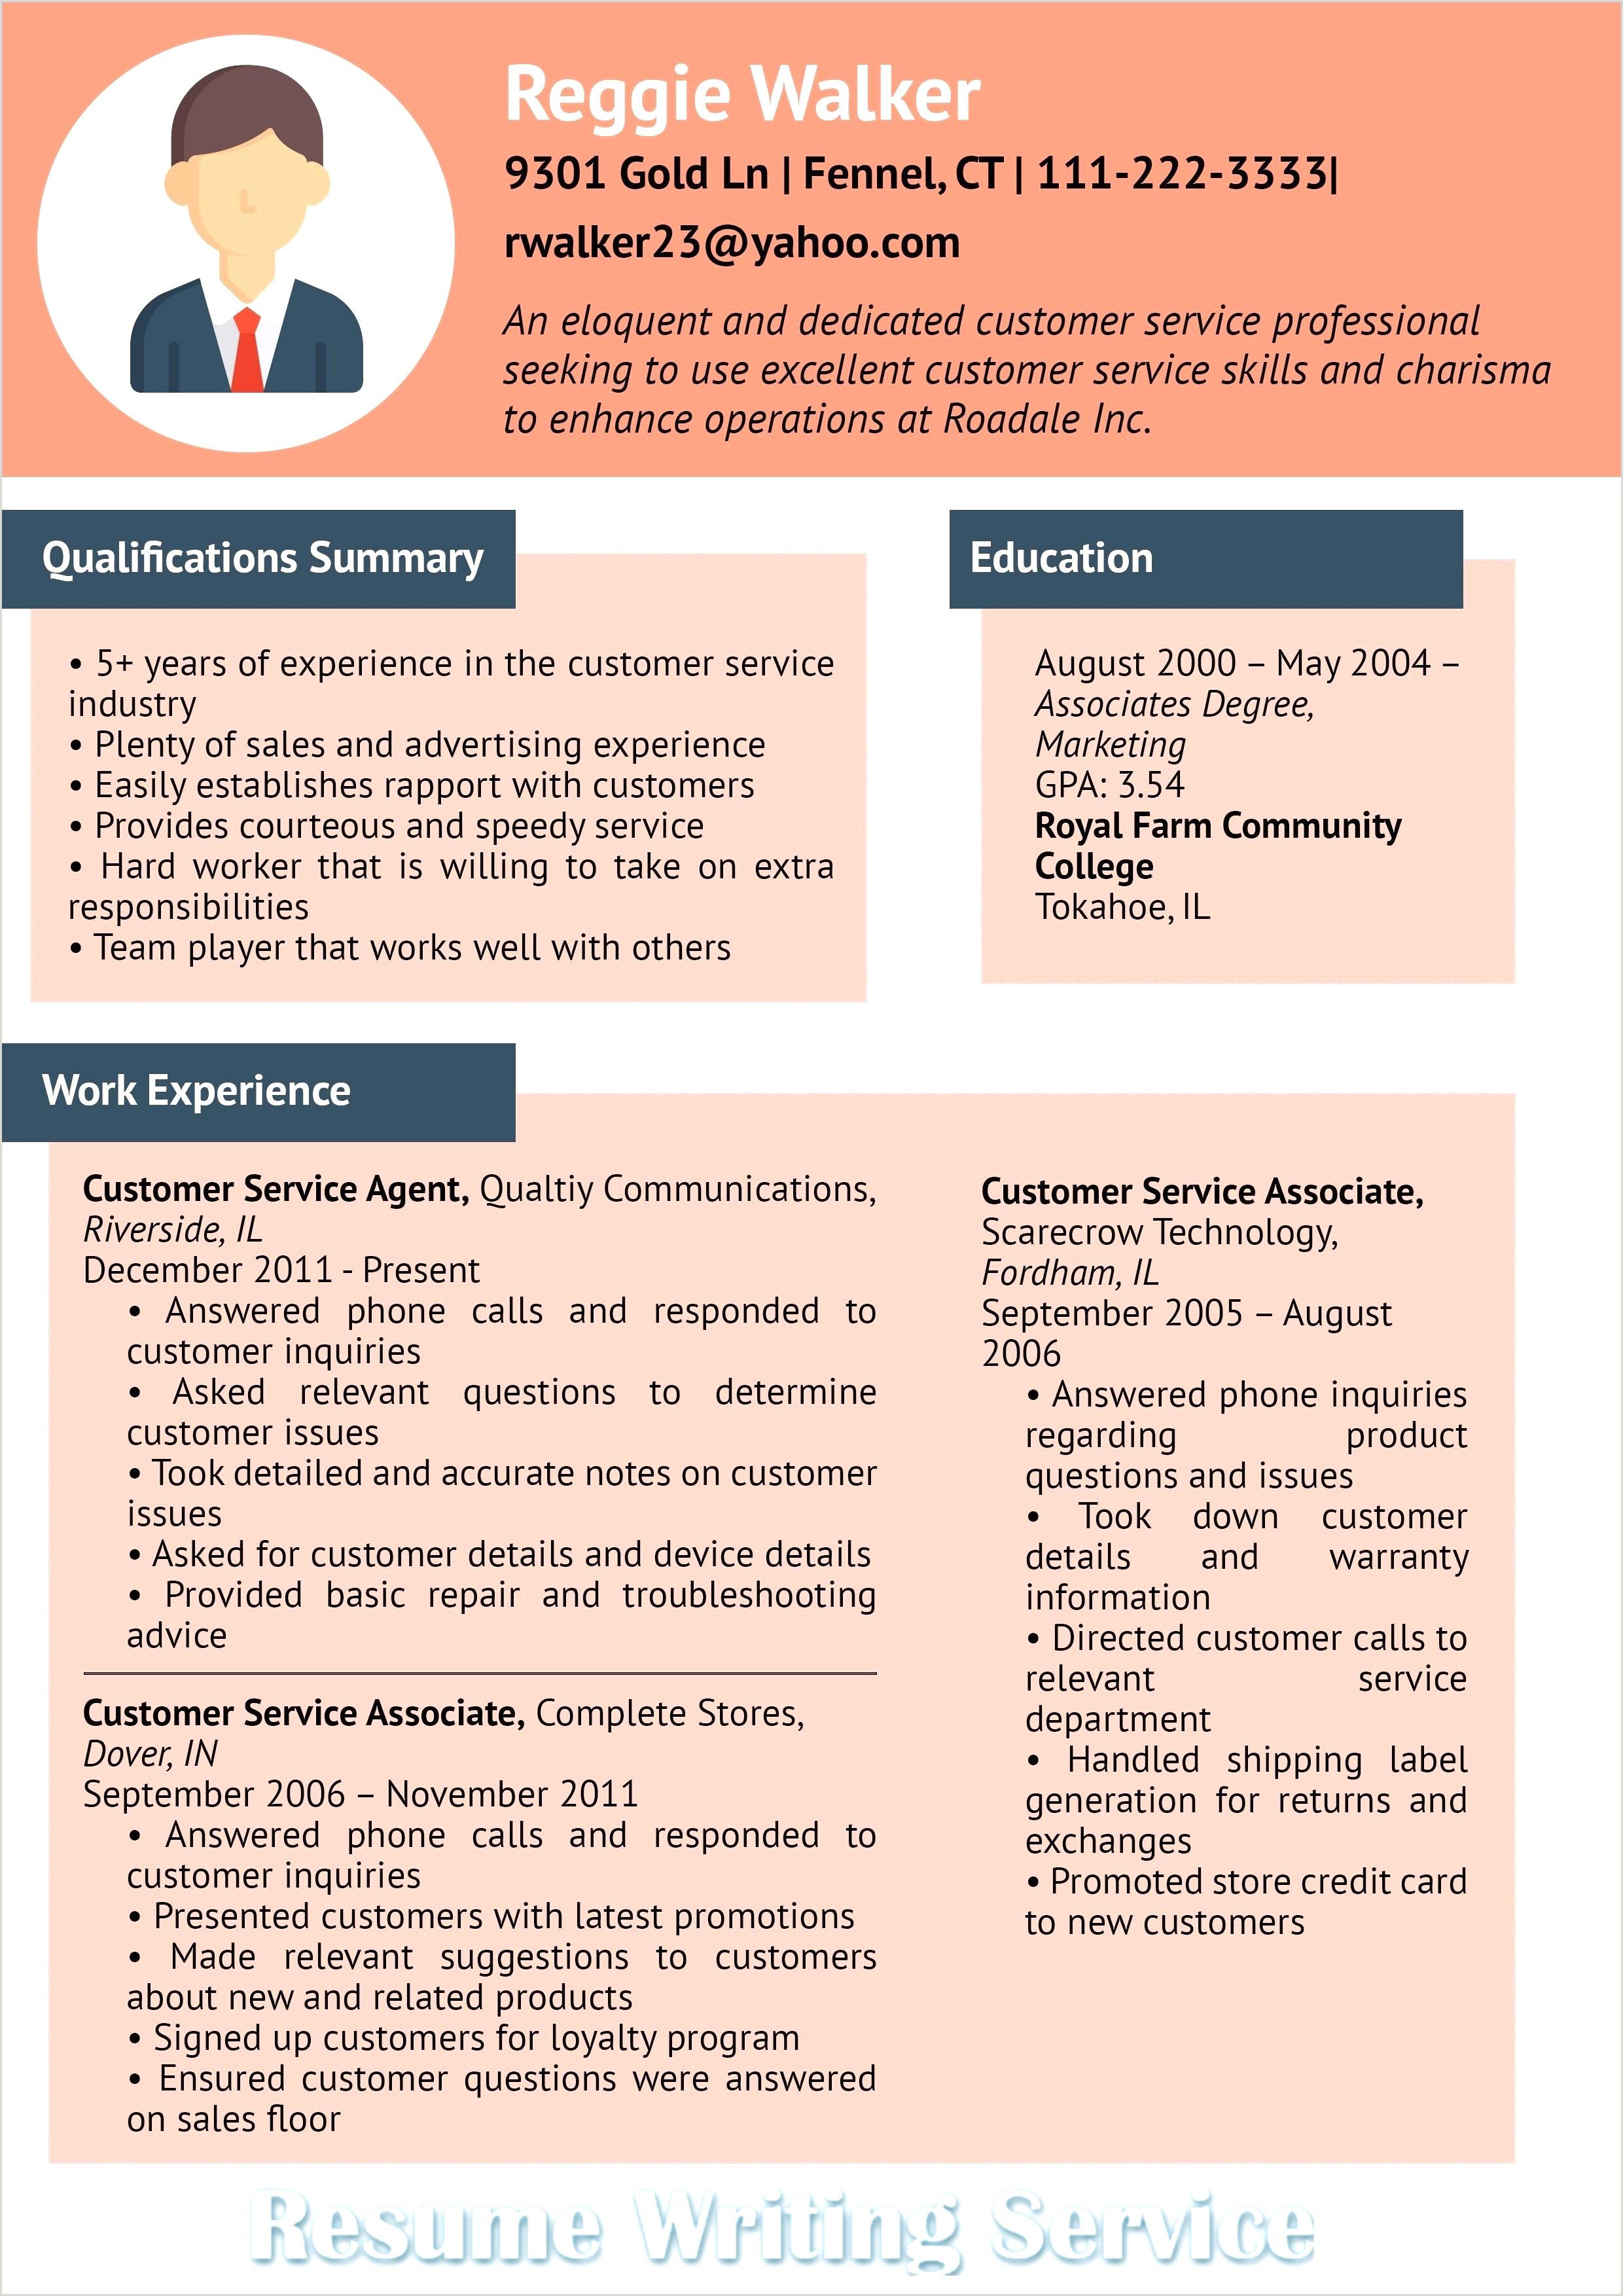 Customer Service associate Job Description Resume 10 Summary In A Resume Examples